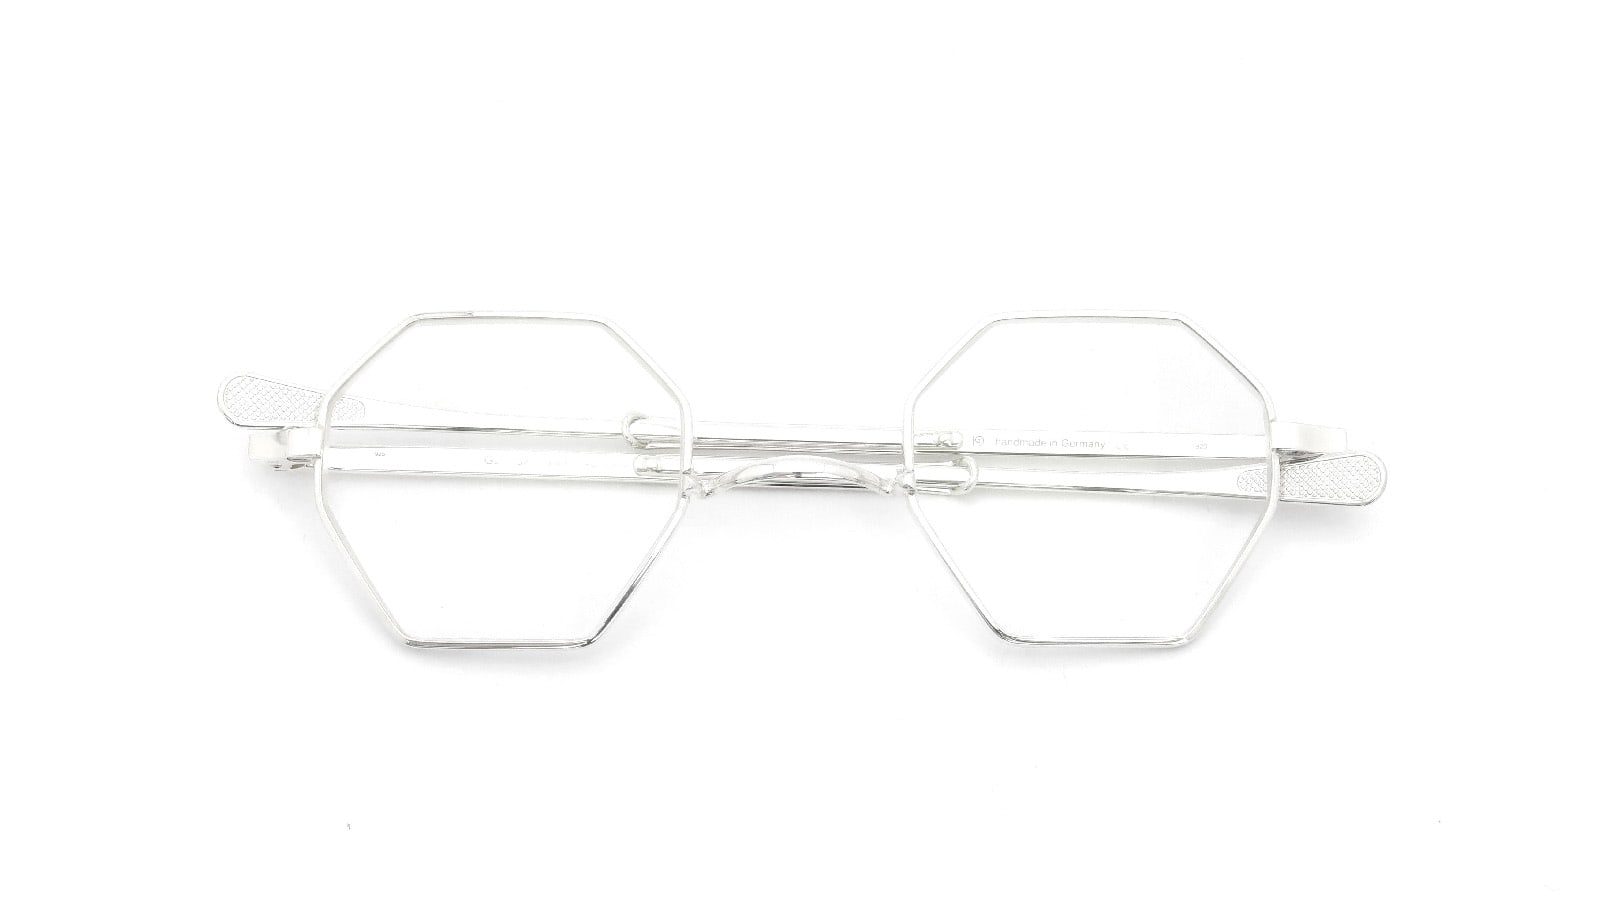 GERNOT LINDNER GL150 mod.159 Medium-Bridge Adjustable 4